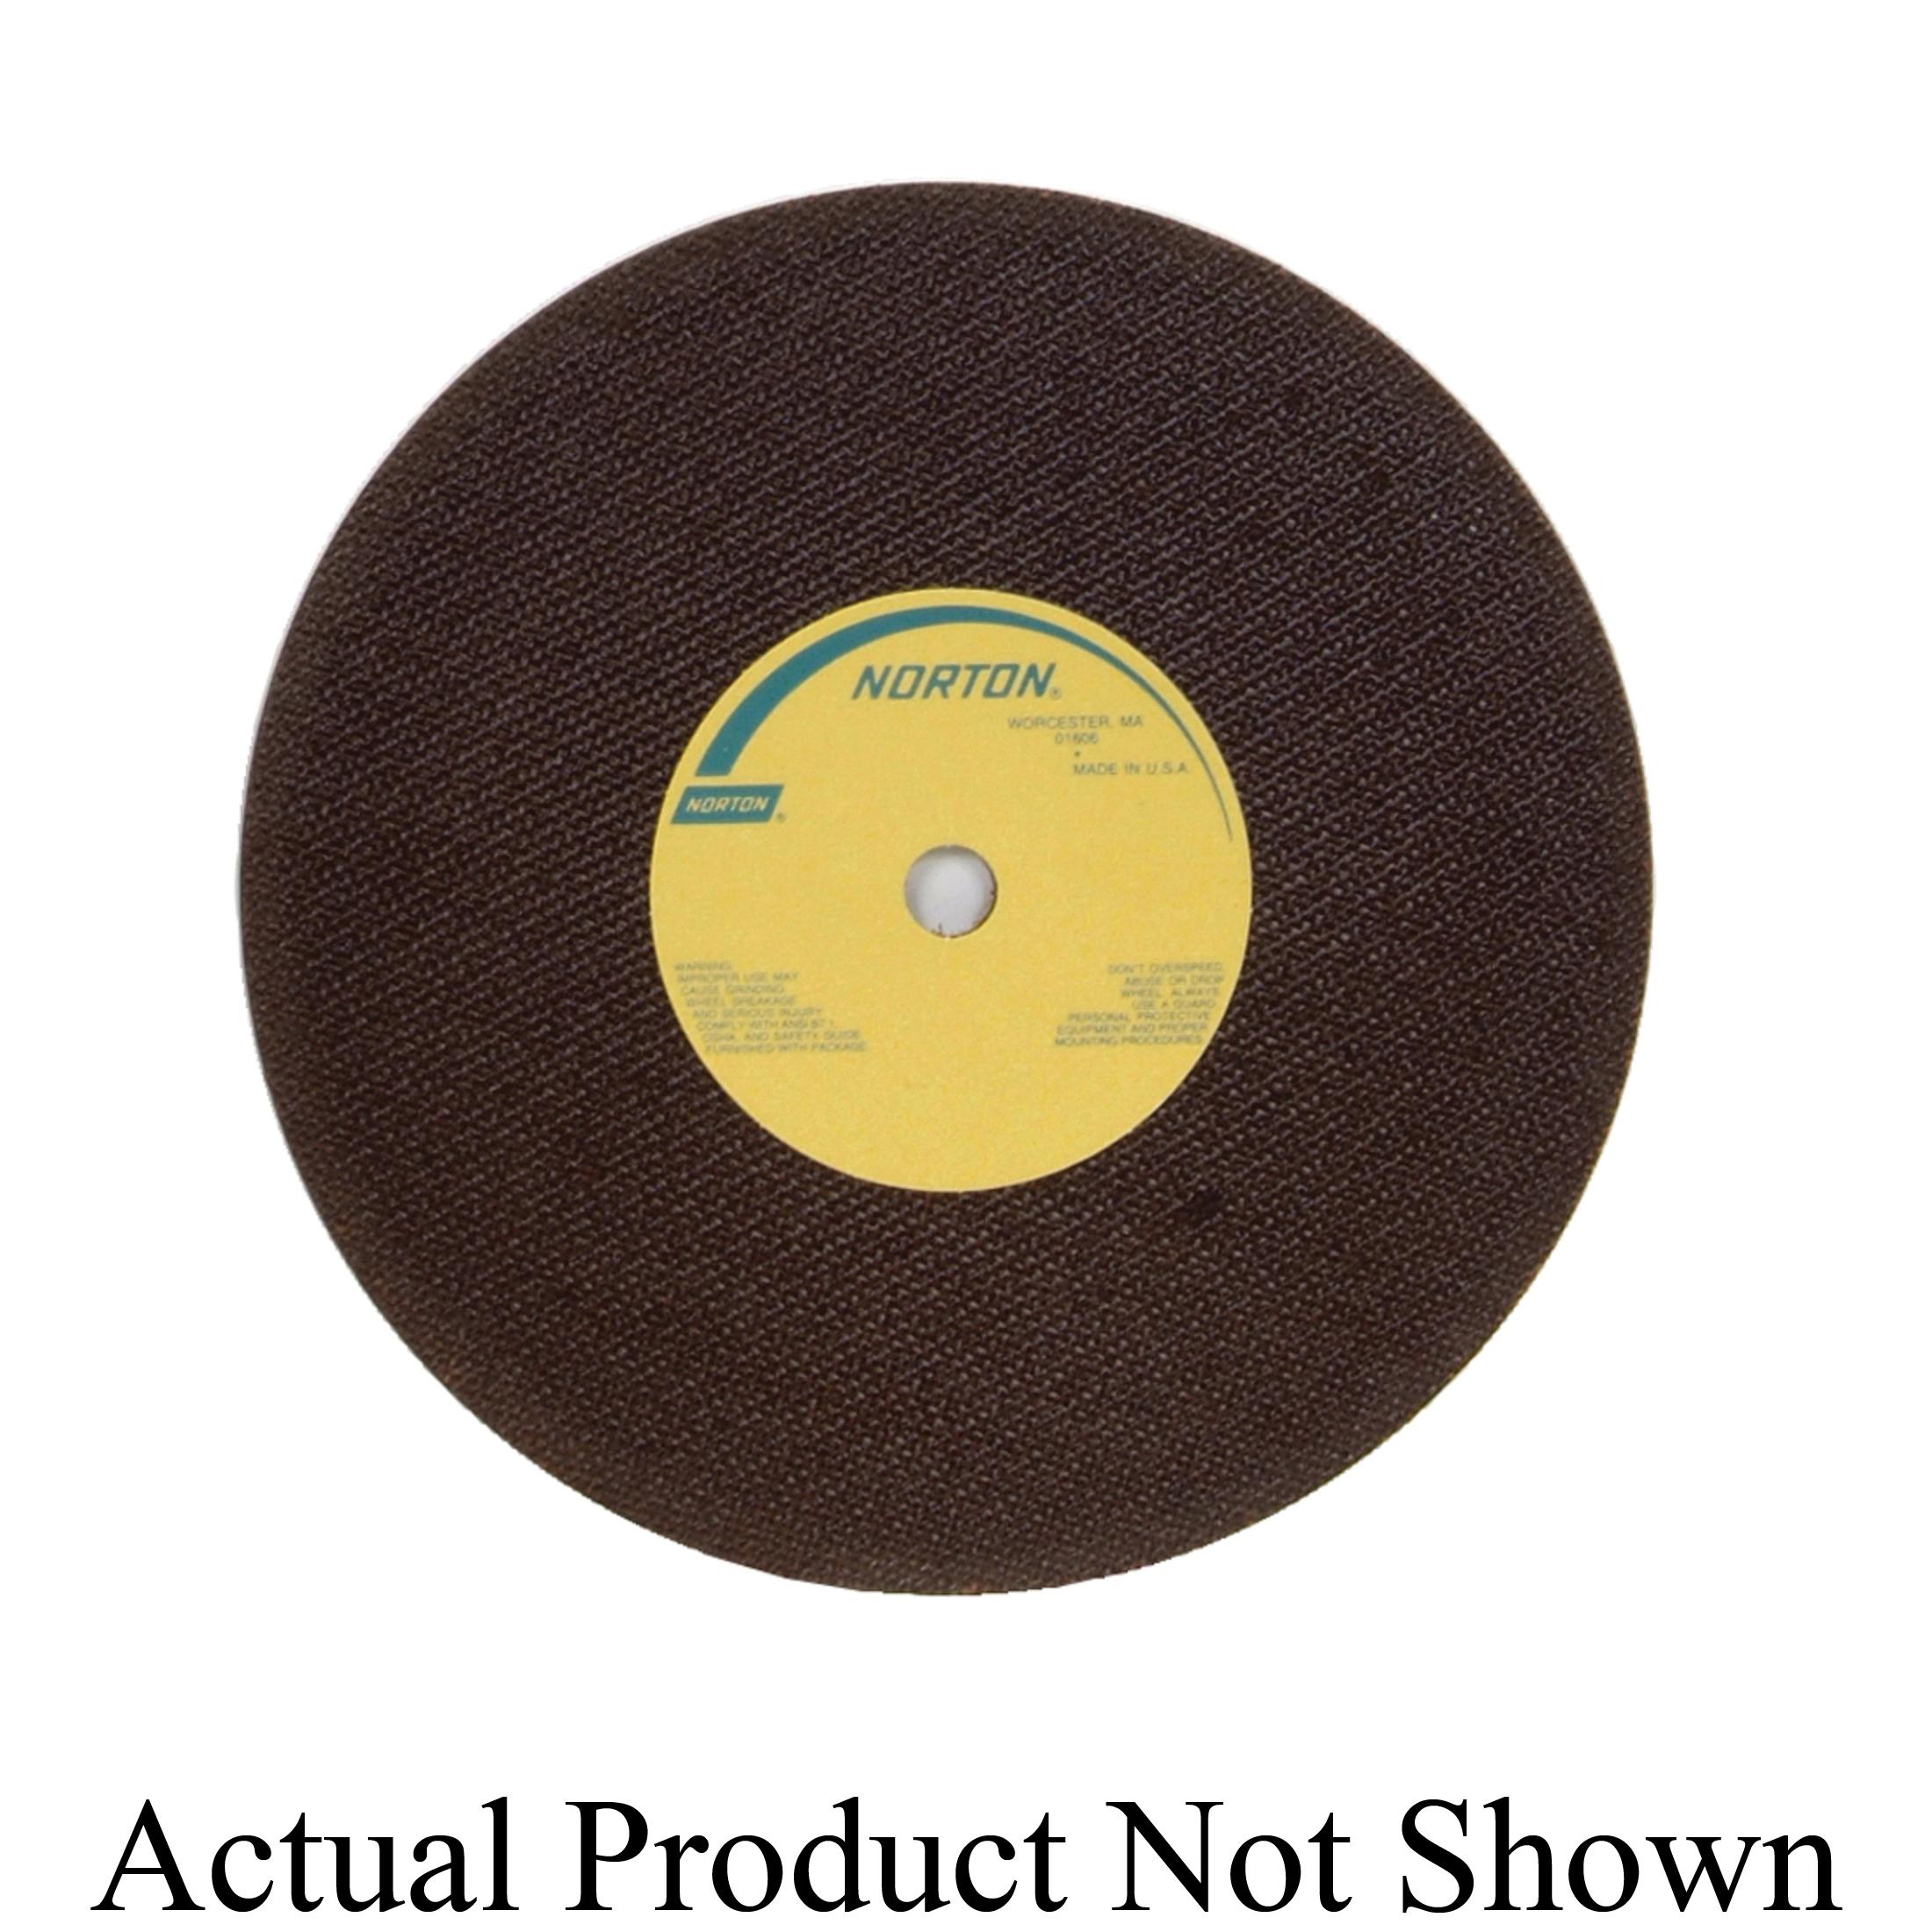 Norton® 66253149317 OBNA2 Toolroom Cut-Off Wheel, 10 in Dia x 0.06 in THK, 5/8 in Center Hole, 60 Grit, Aluminum Oxide Abrasive